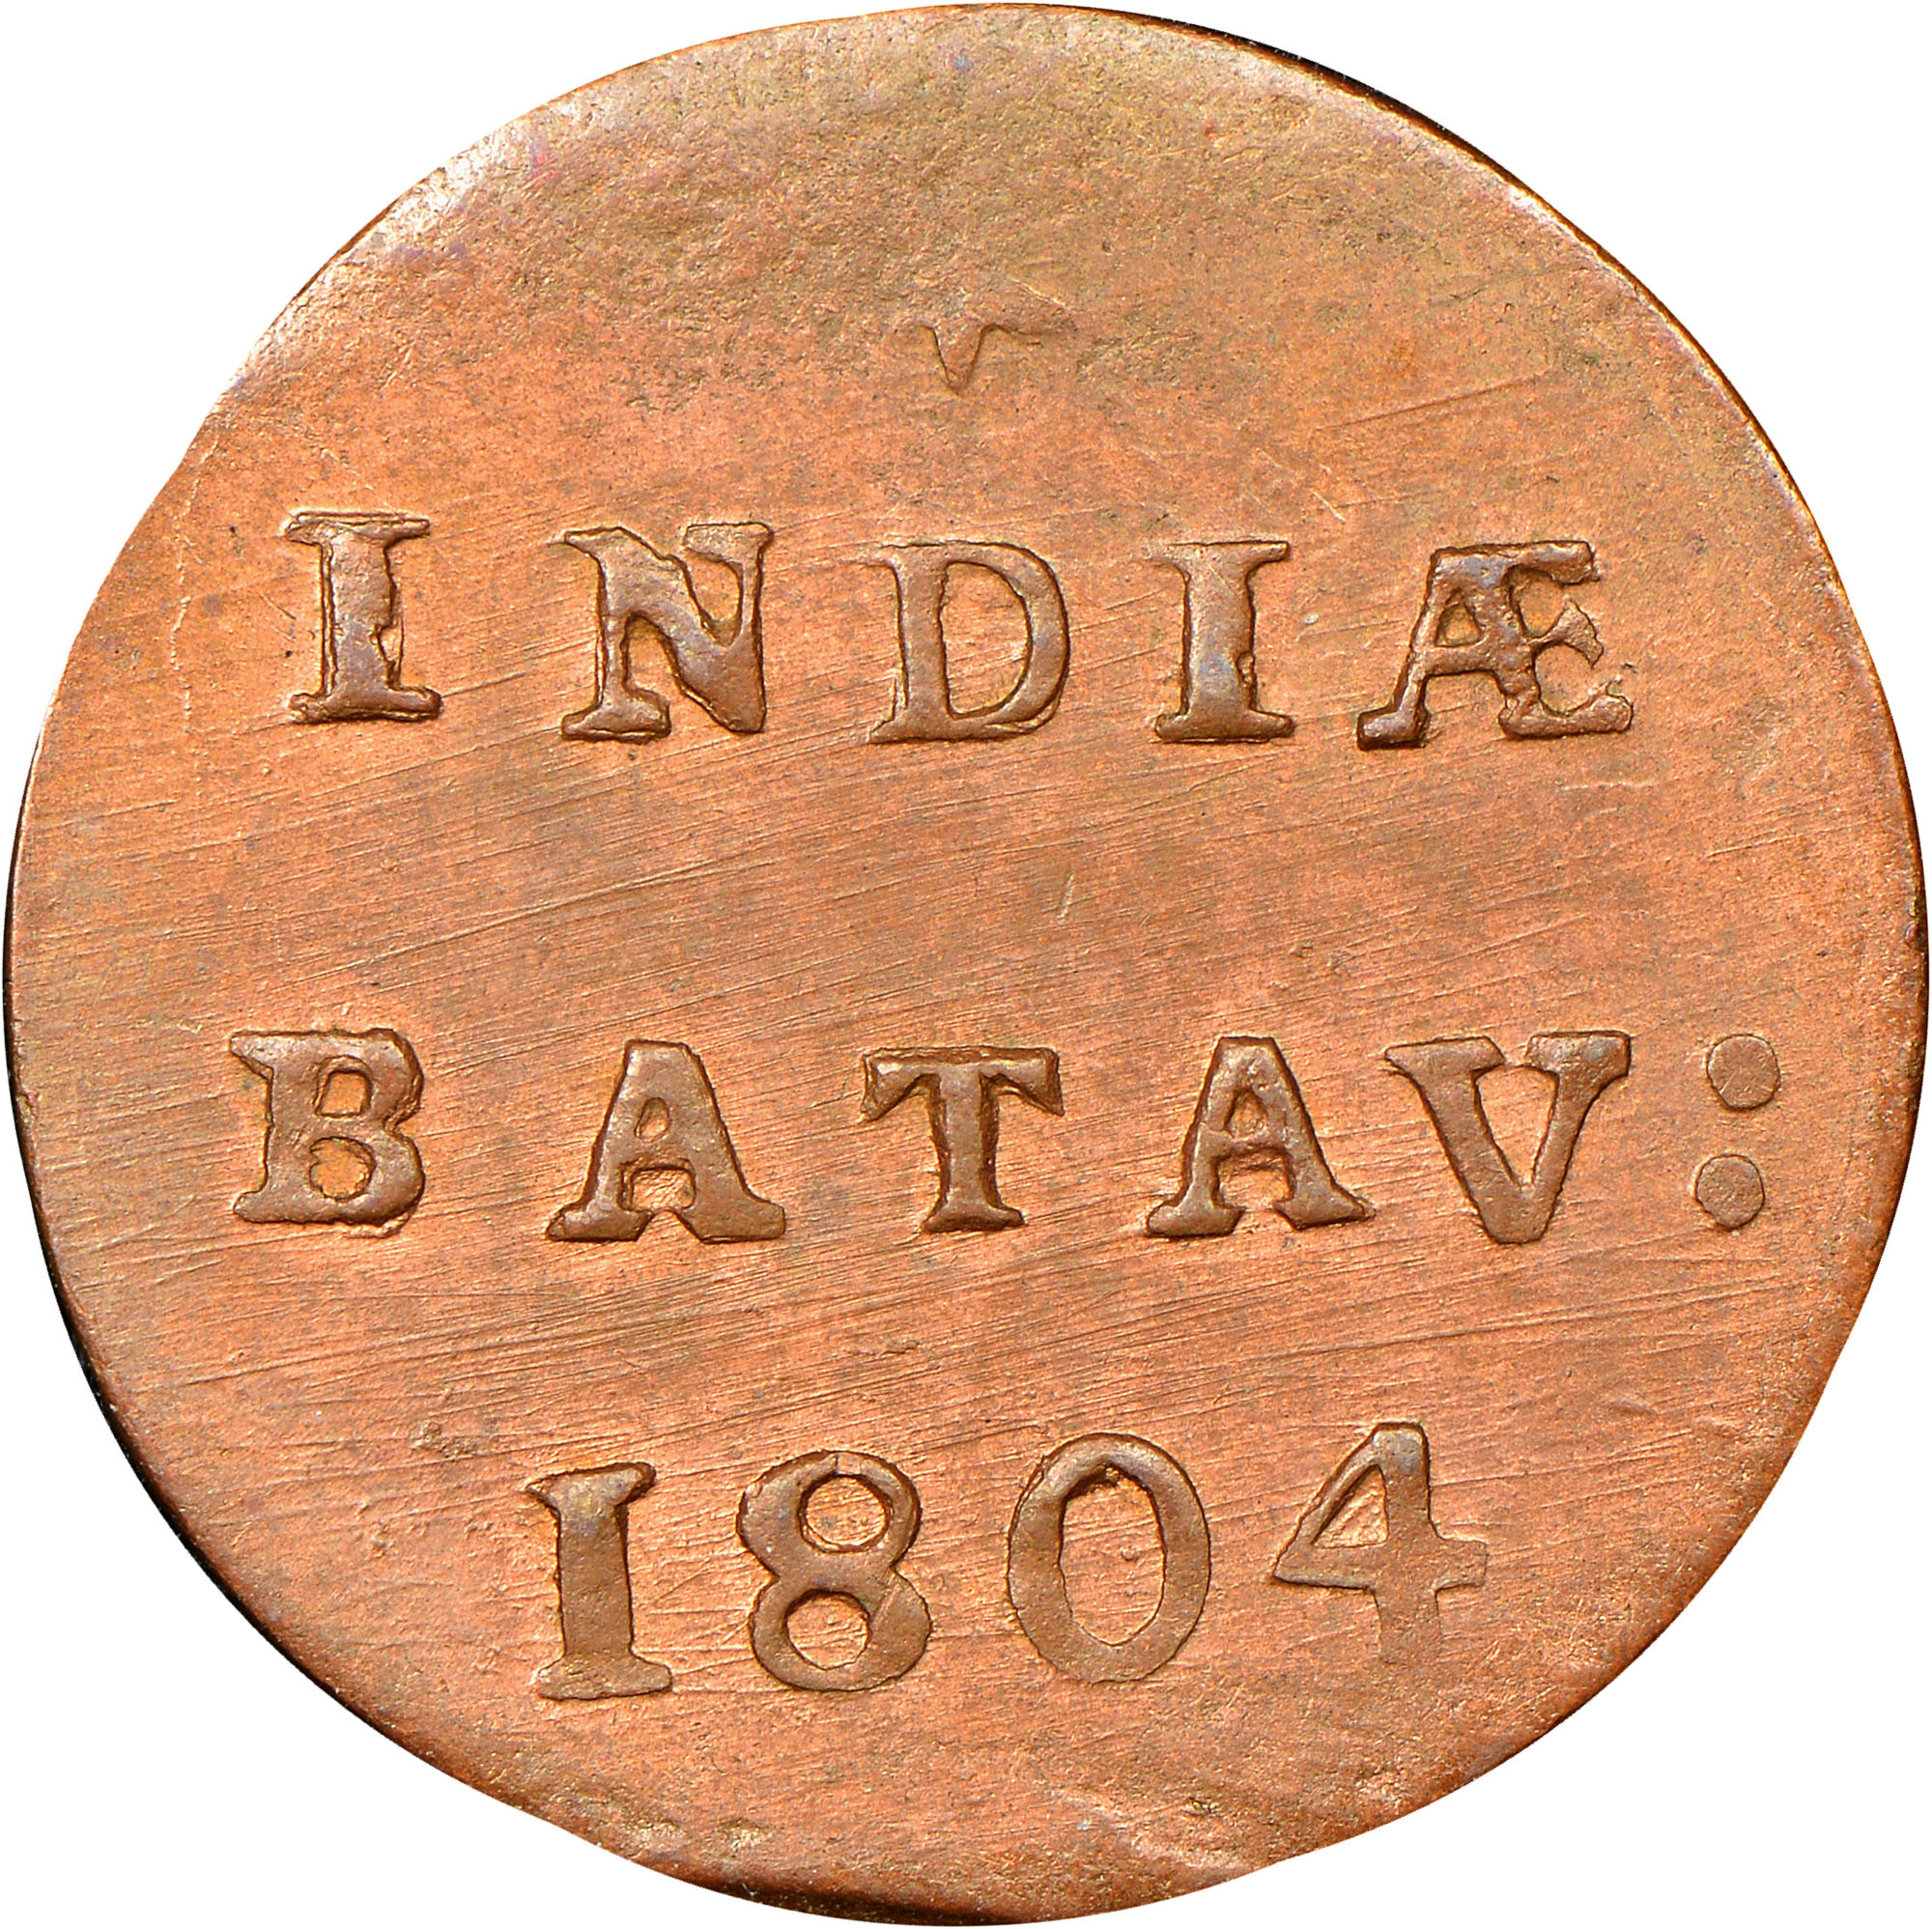 Netherlands East Indies 1/2 Duit reverse